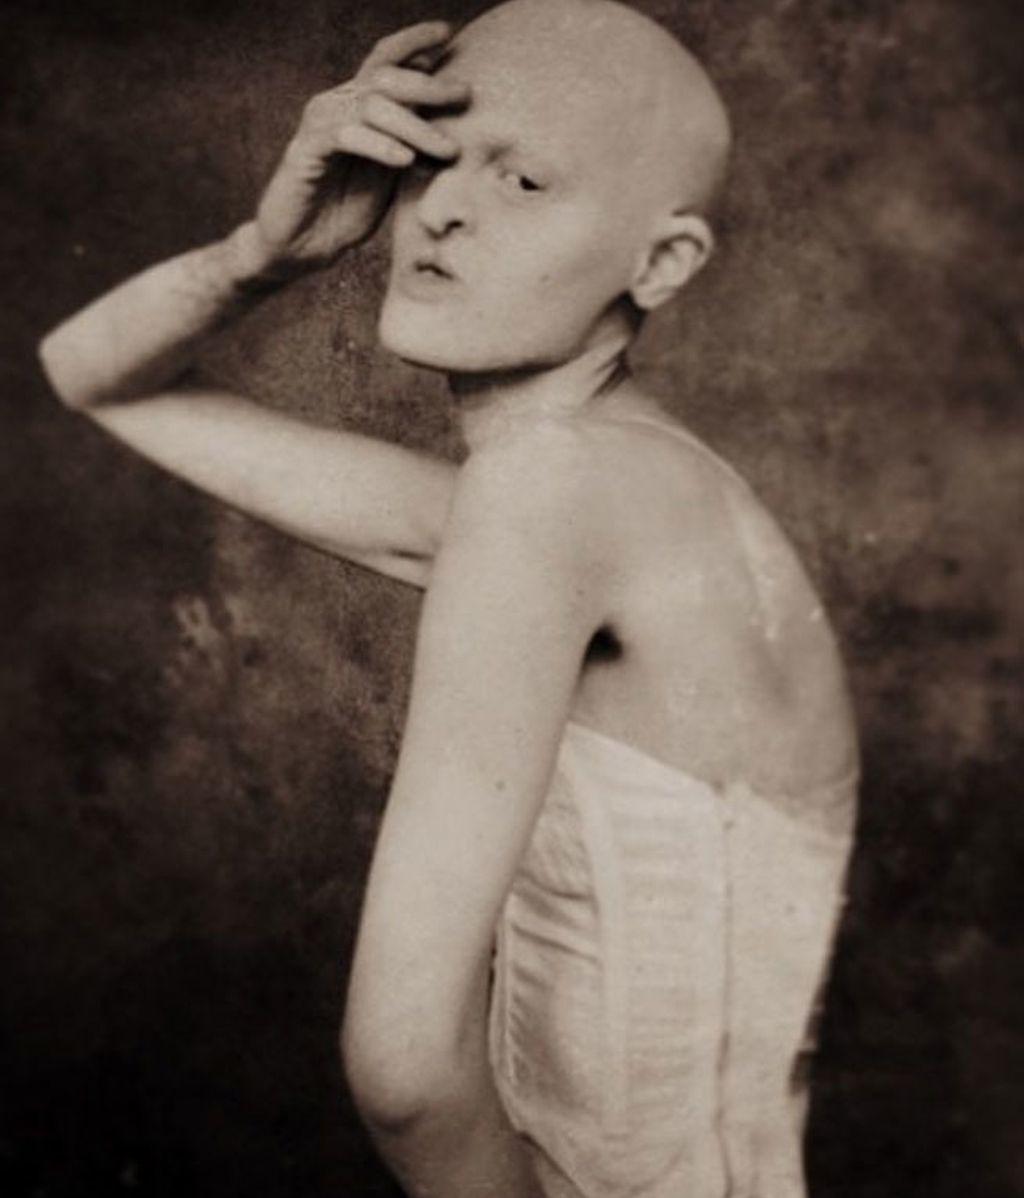 La modelo Melanie Gaydos padece Displasia Ectodérmica